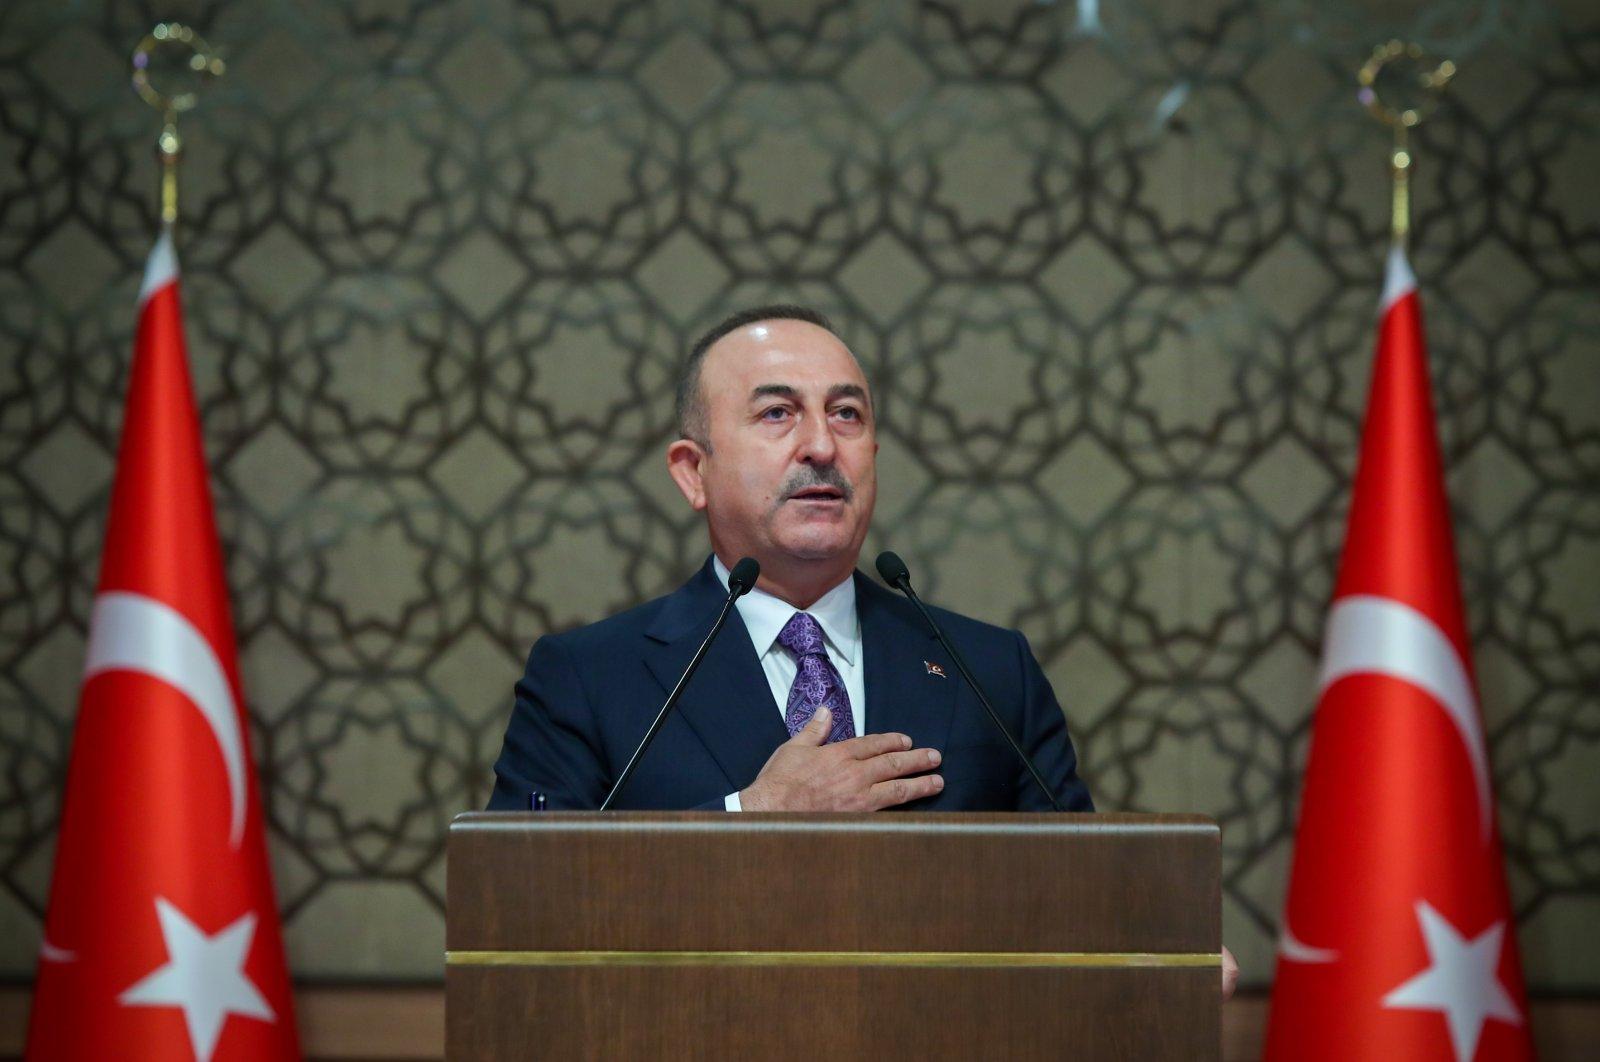 Foreign Minister Mevlüt Çavuşoğlu speaks at the 12th ambassadors' summit at the Presidential Complex in Ankara, Turkey, Nov. 10, 2020. (AA Photo)